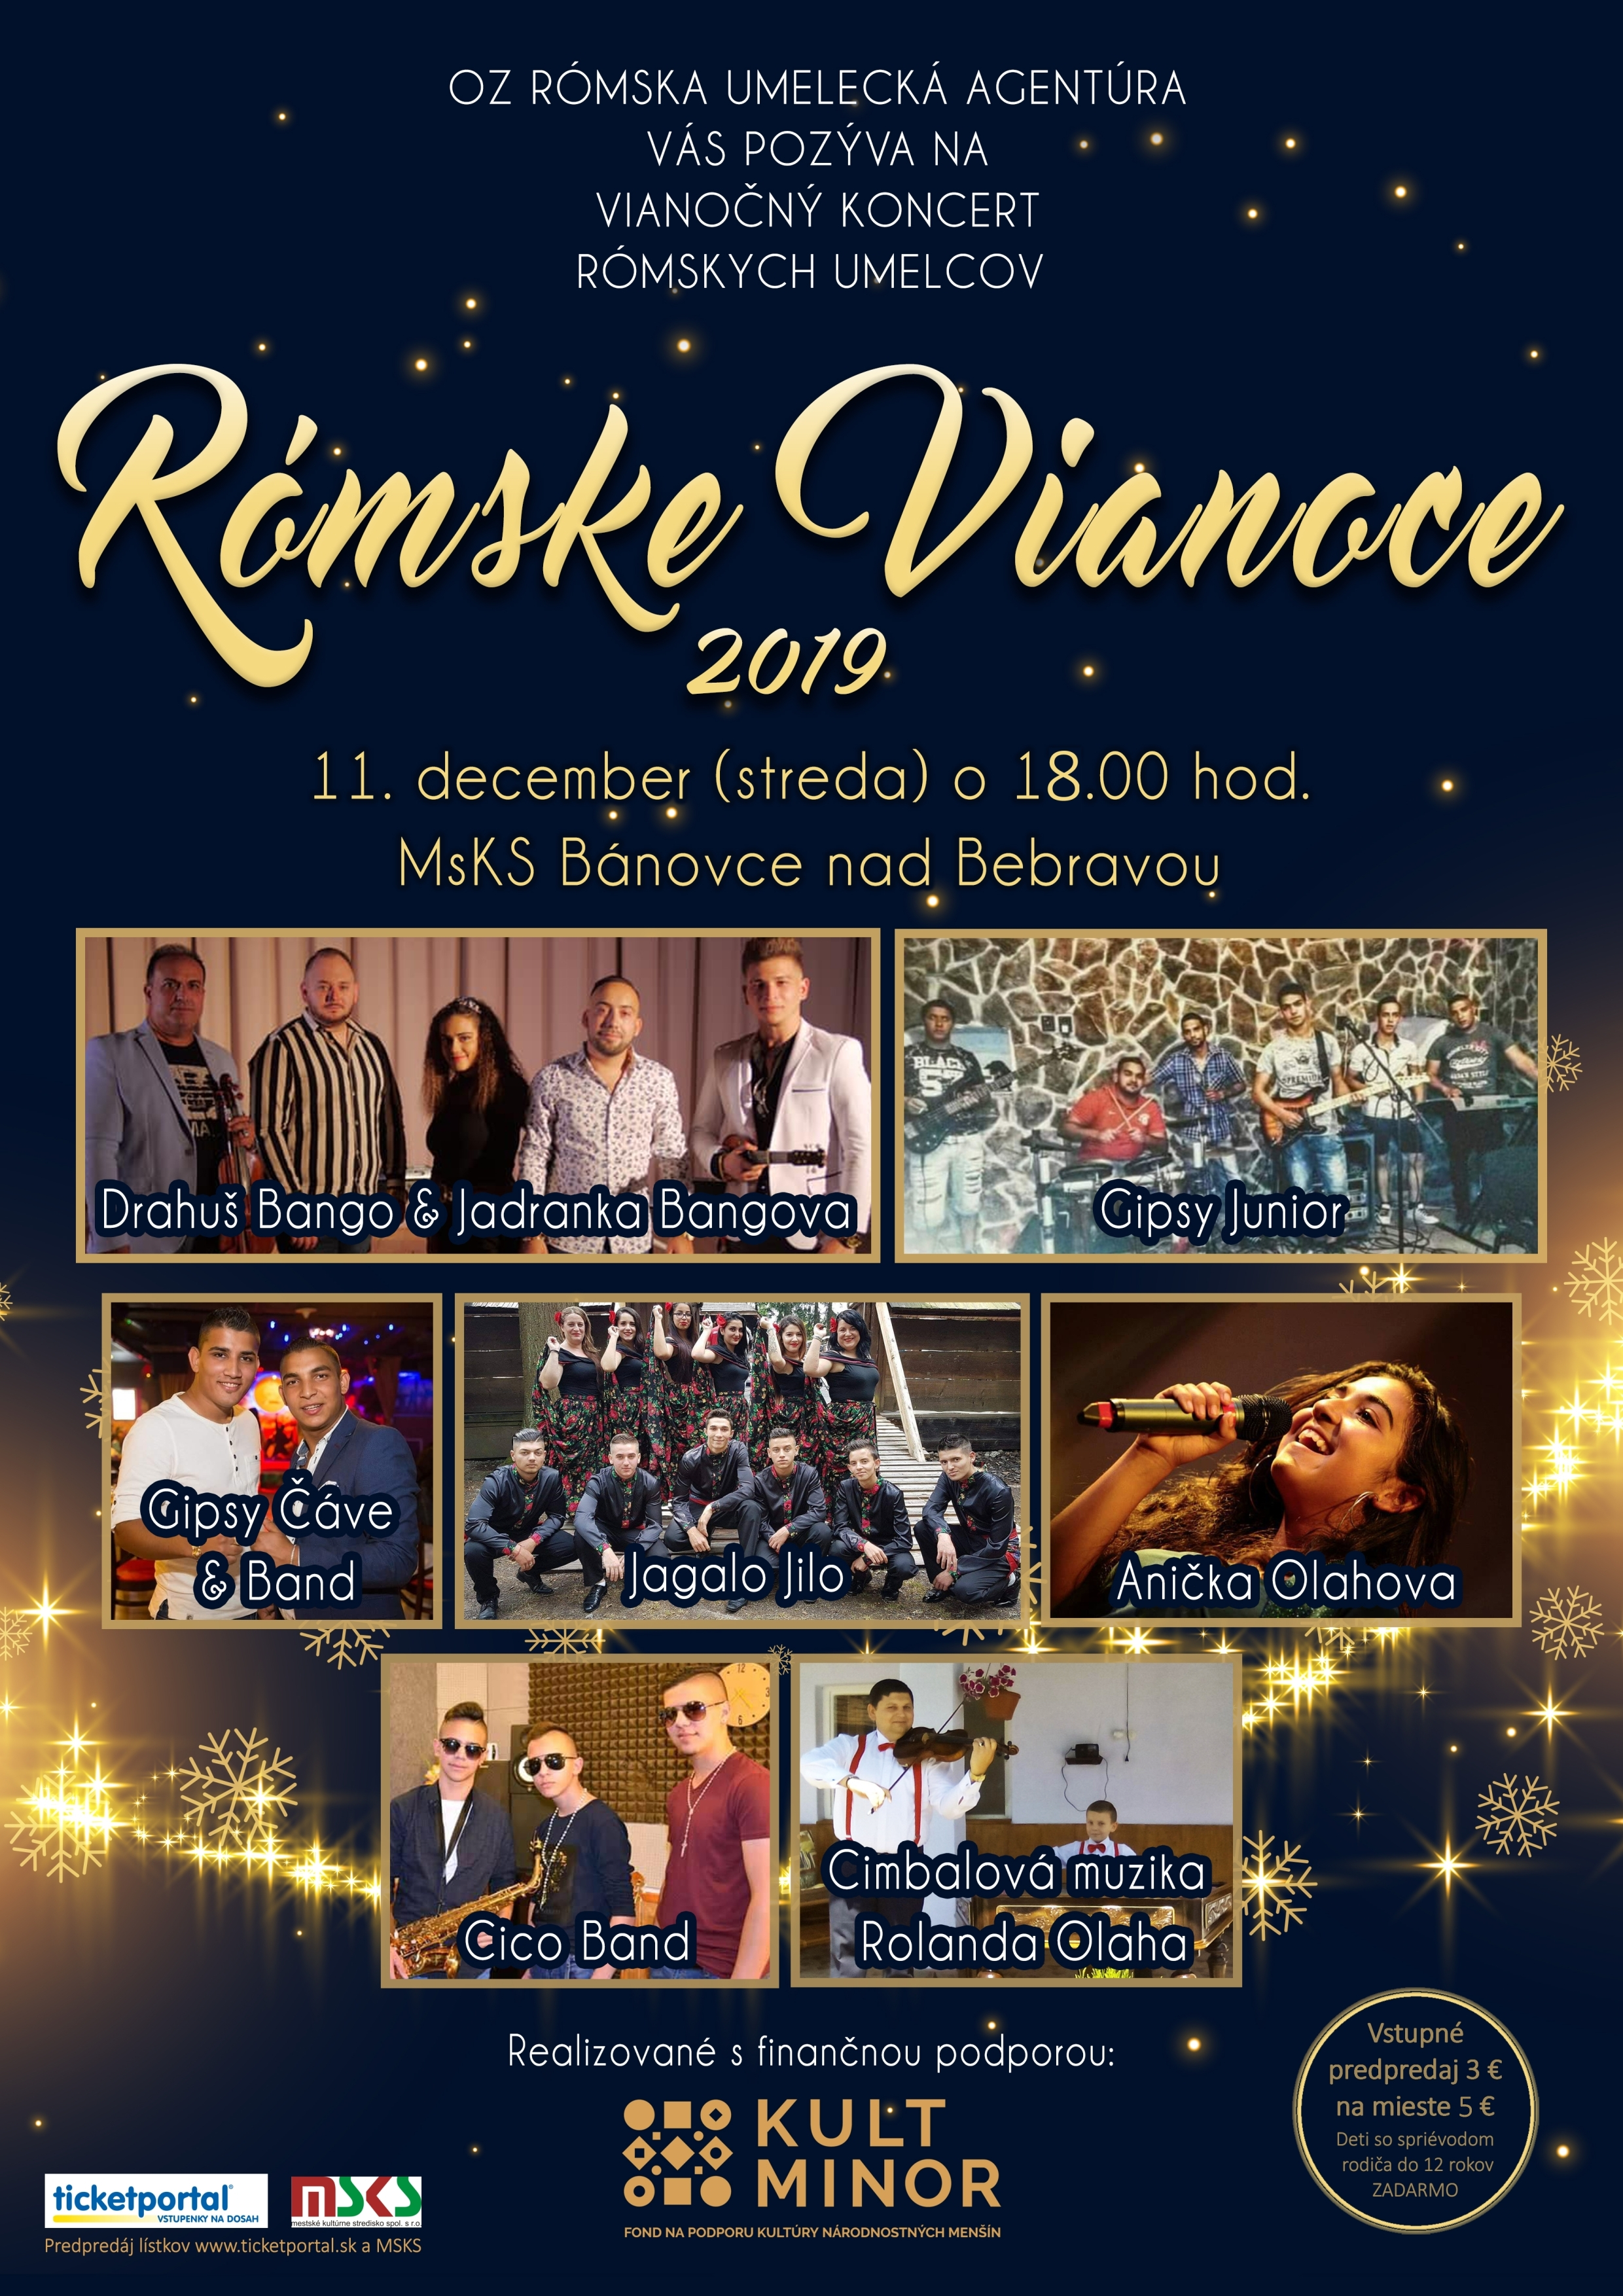 picture Rómske Vianoce 2019